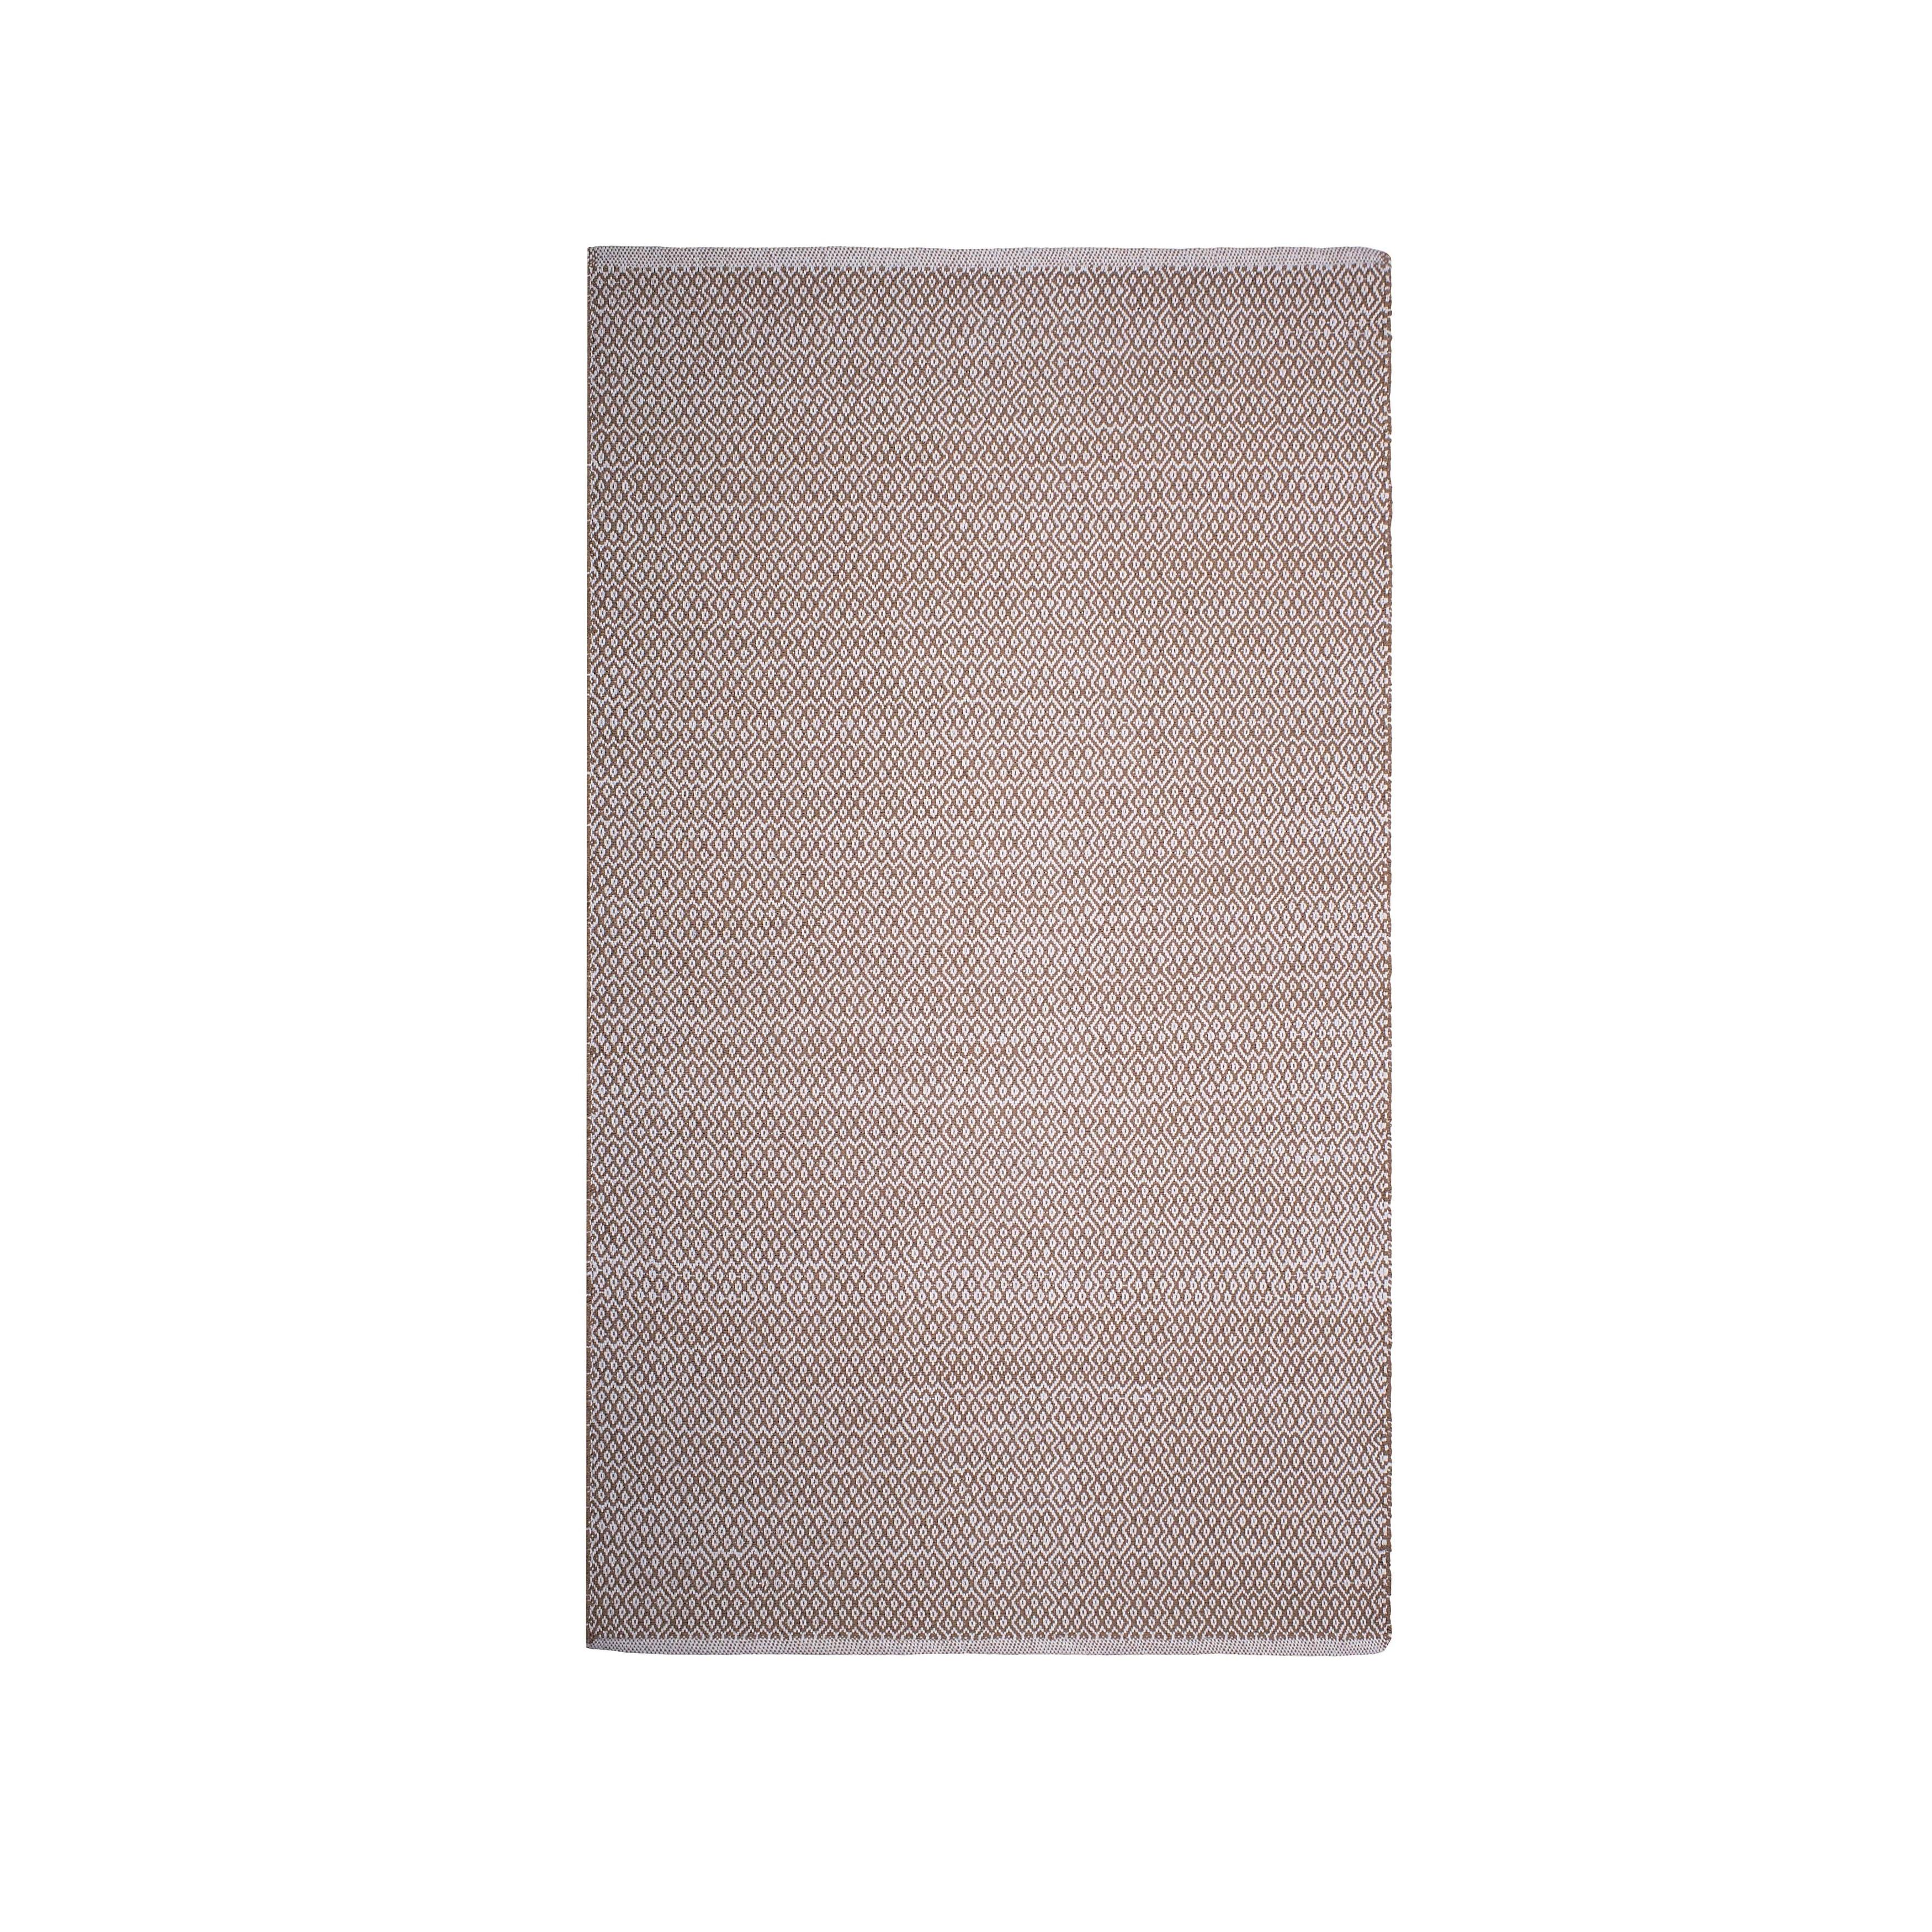 Shop Fab Habitat 100 Recycled Cotton Flat Weave Handwoven Floor Mat